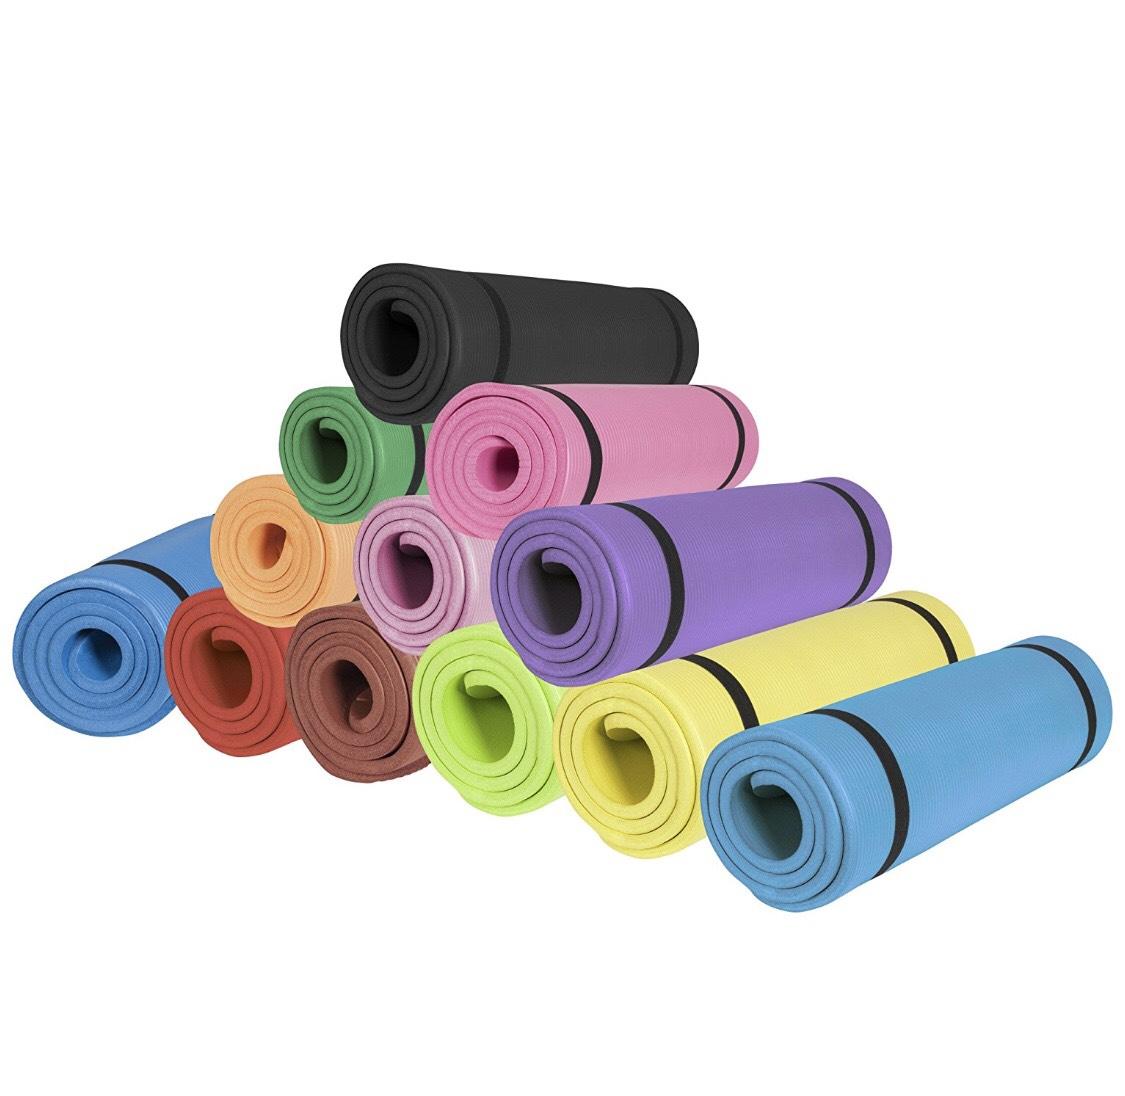 GORILLA SPORTS Yogamatte alle Farben + gratis Loop Band in Pink gratis Versand